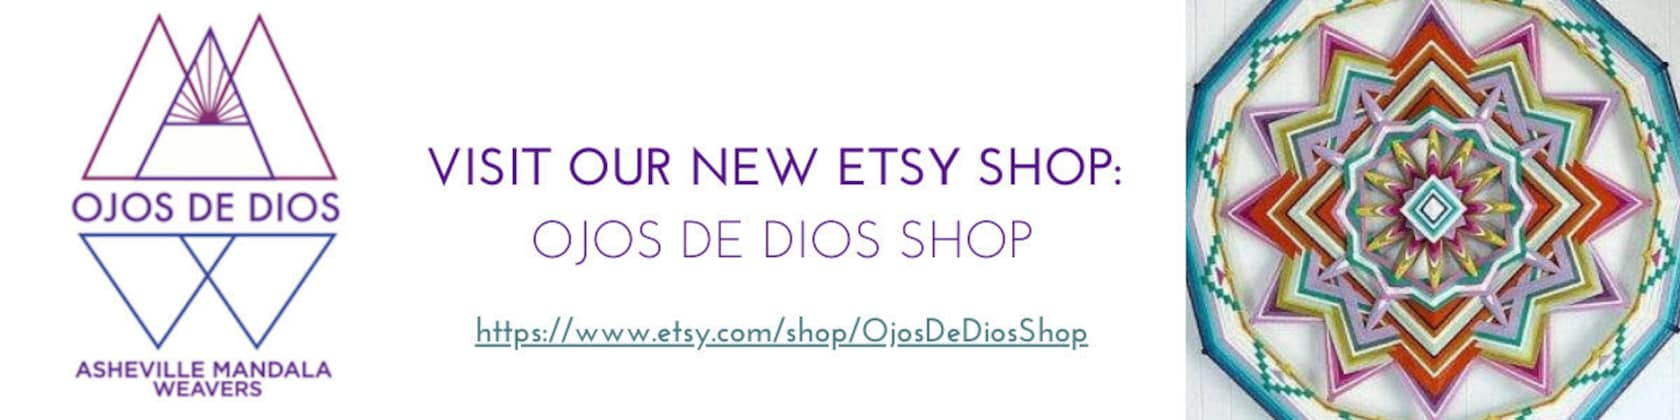 New Shop Ojosdediosshop By Asheville Mandala By Jaysmandalas